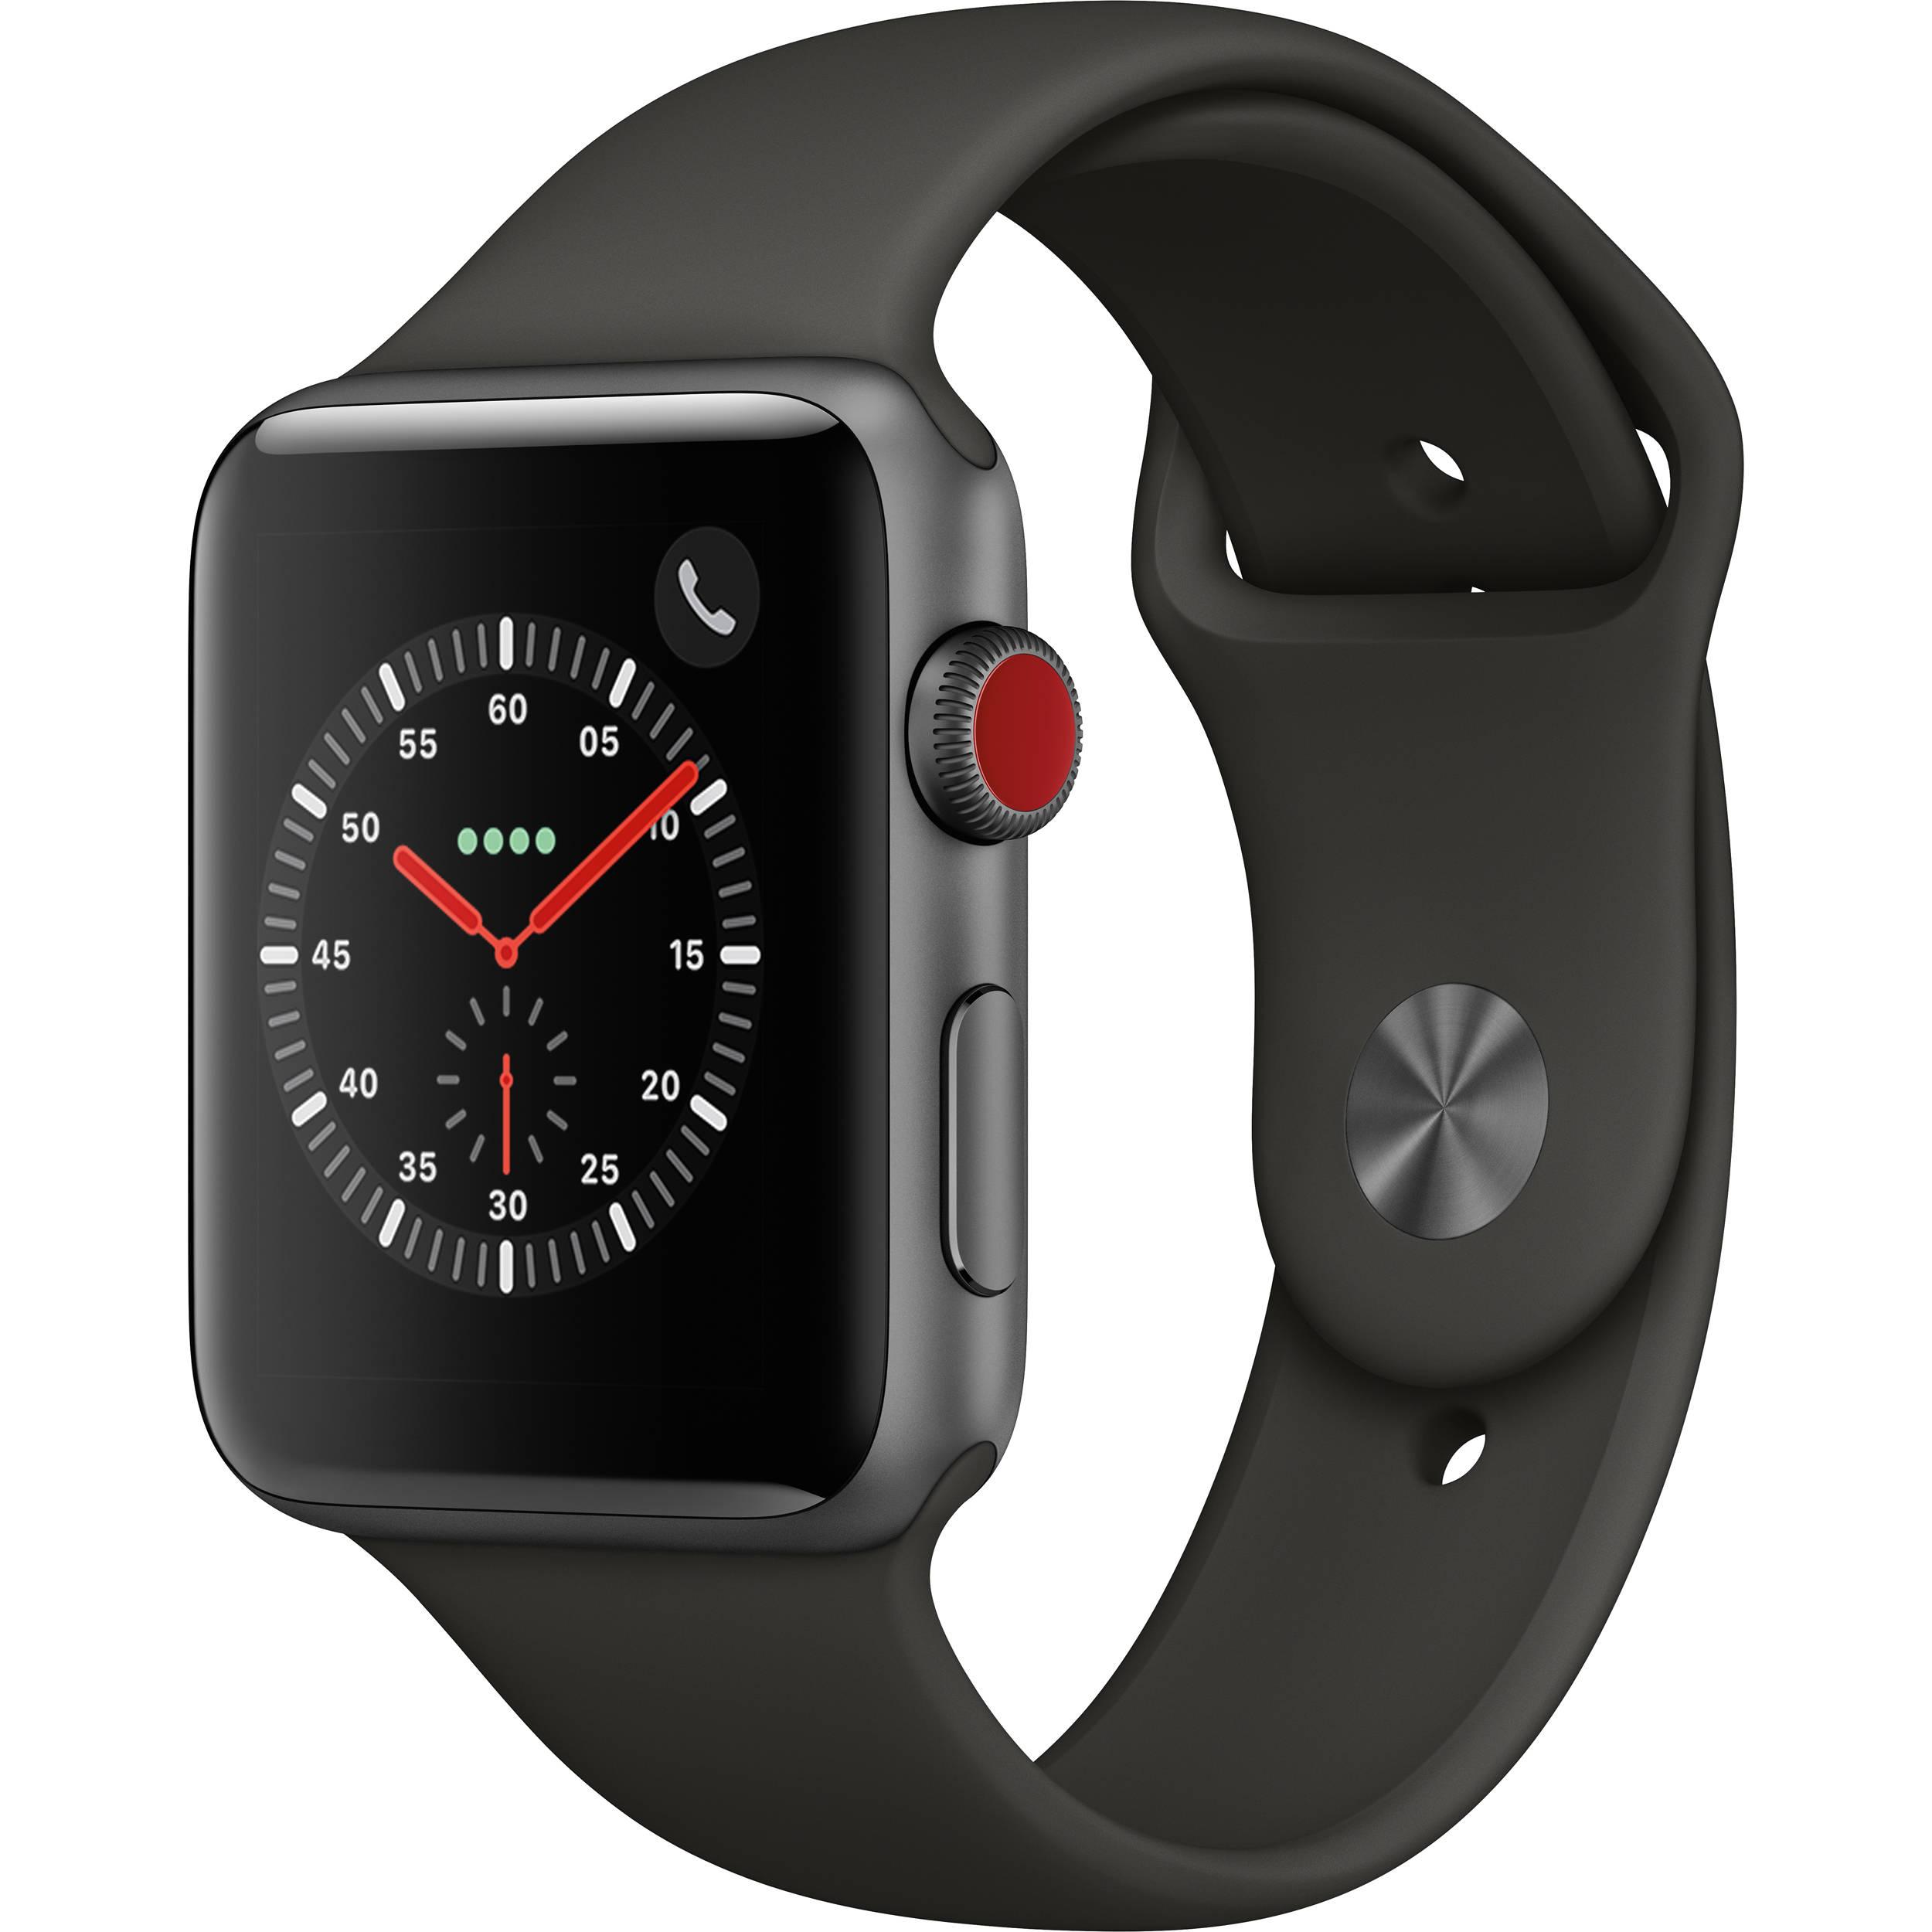 online store 7675d 6b523 Apple Watch Series 3 42mm Smartwatch (GPS + Cellular, Space Gray Aluminum  Case, Gray Sport Band)